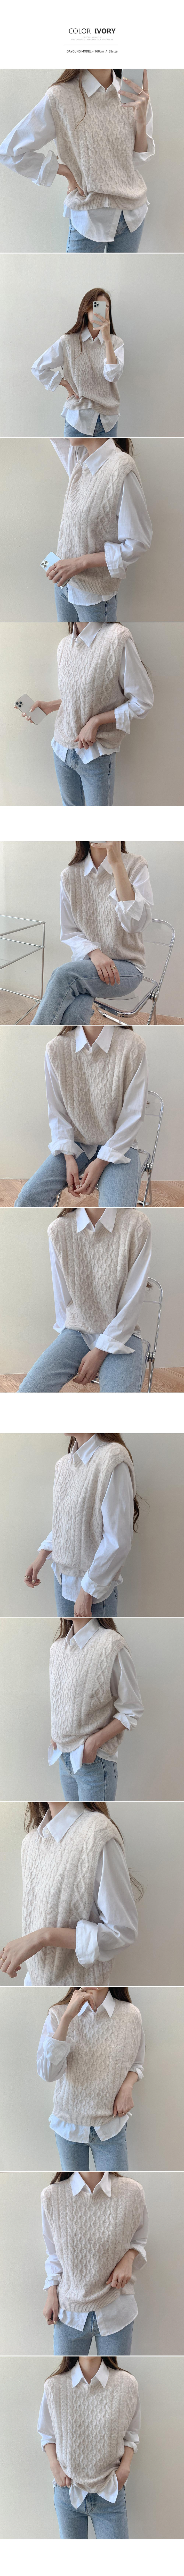 Wool Monsil Round Loose Knitwear Twisted Vest T#YW821